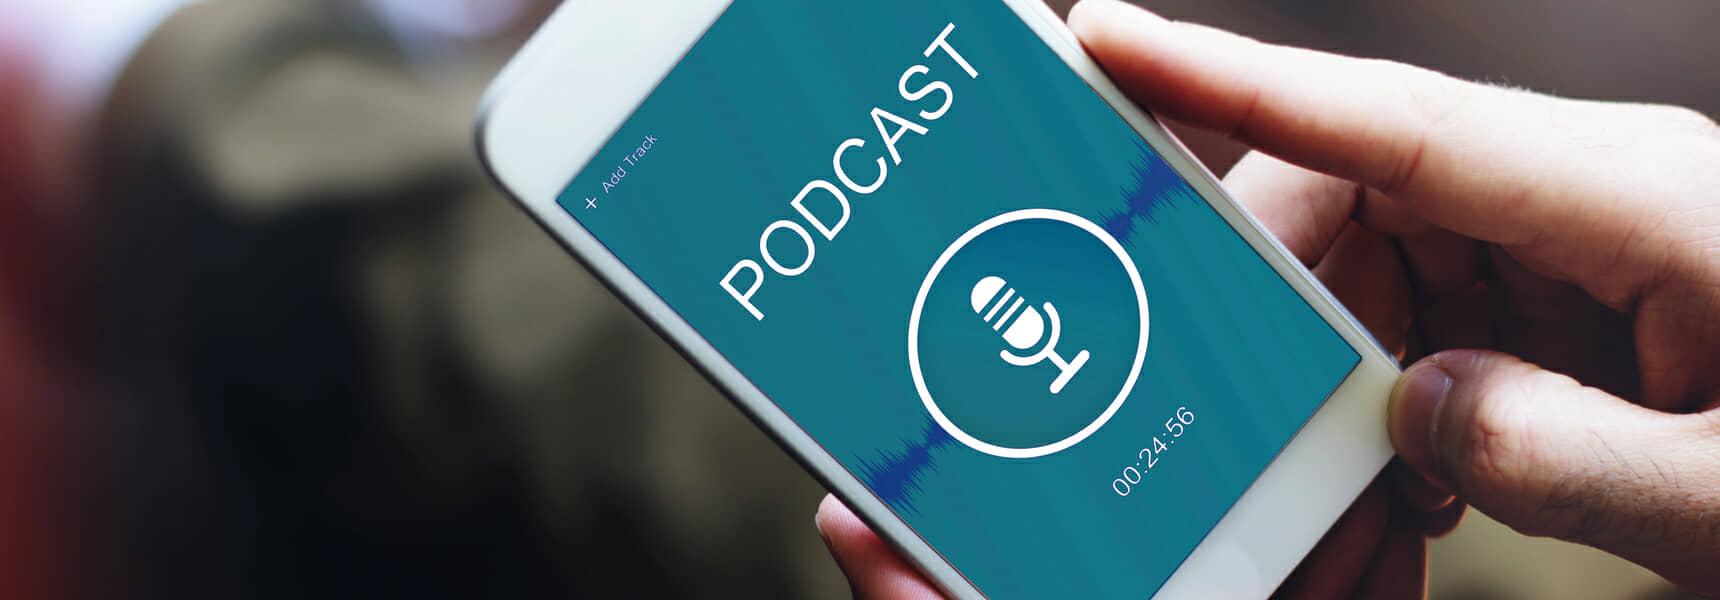 TechTalk Radio chats connectivity with Belinda Fawcett